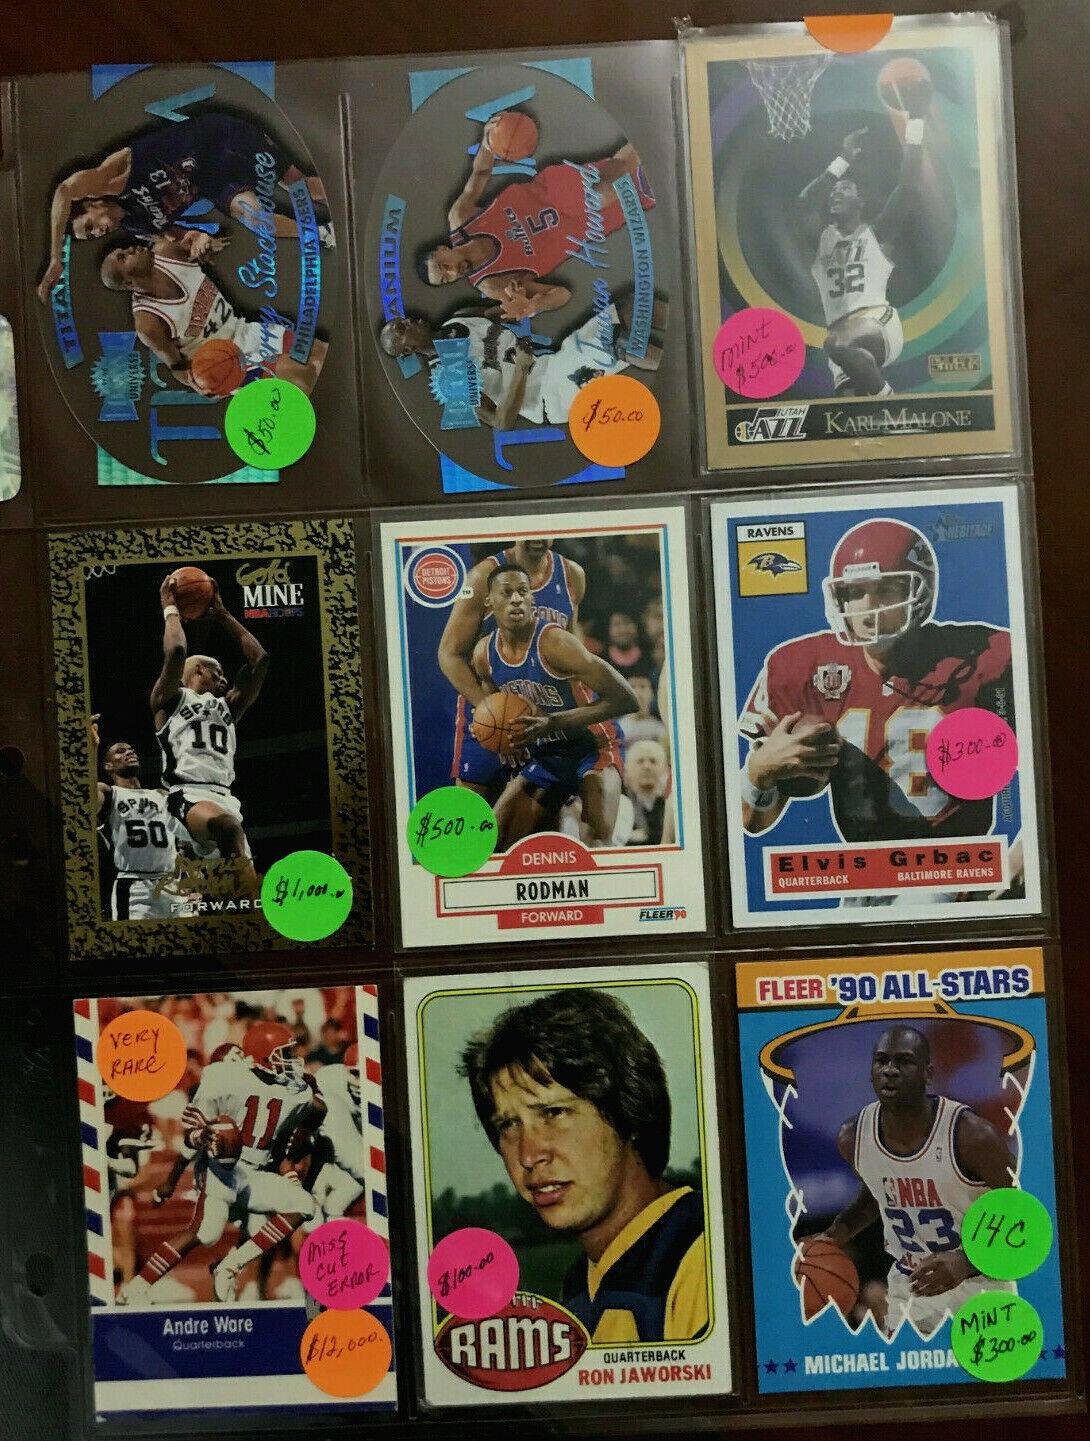 Sports Trading Cards Football Basket Ball Ware Error Rodman 9,000 Lot 14c - $25.00